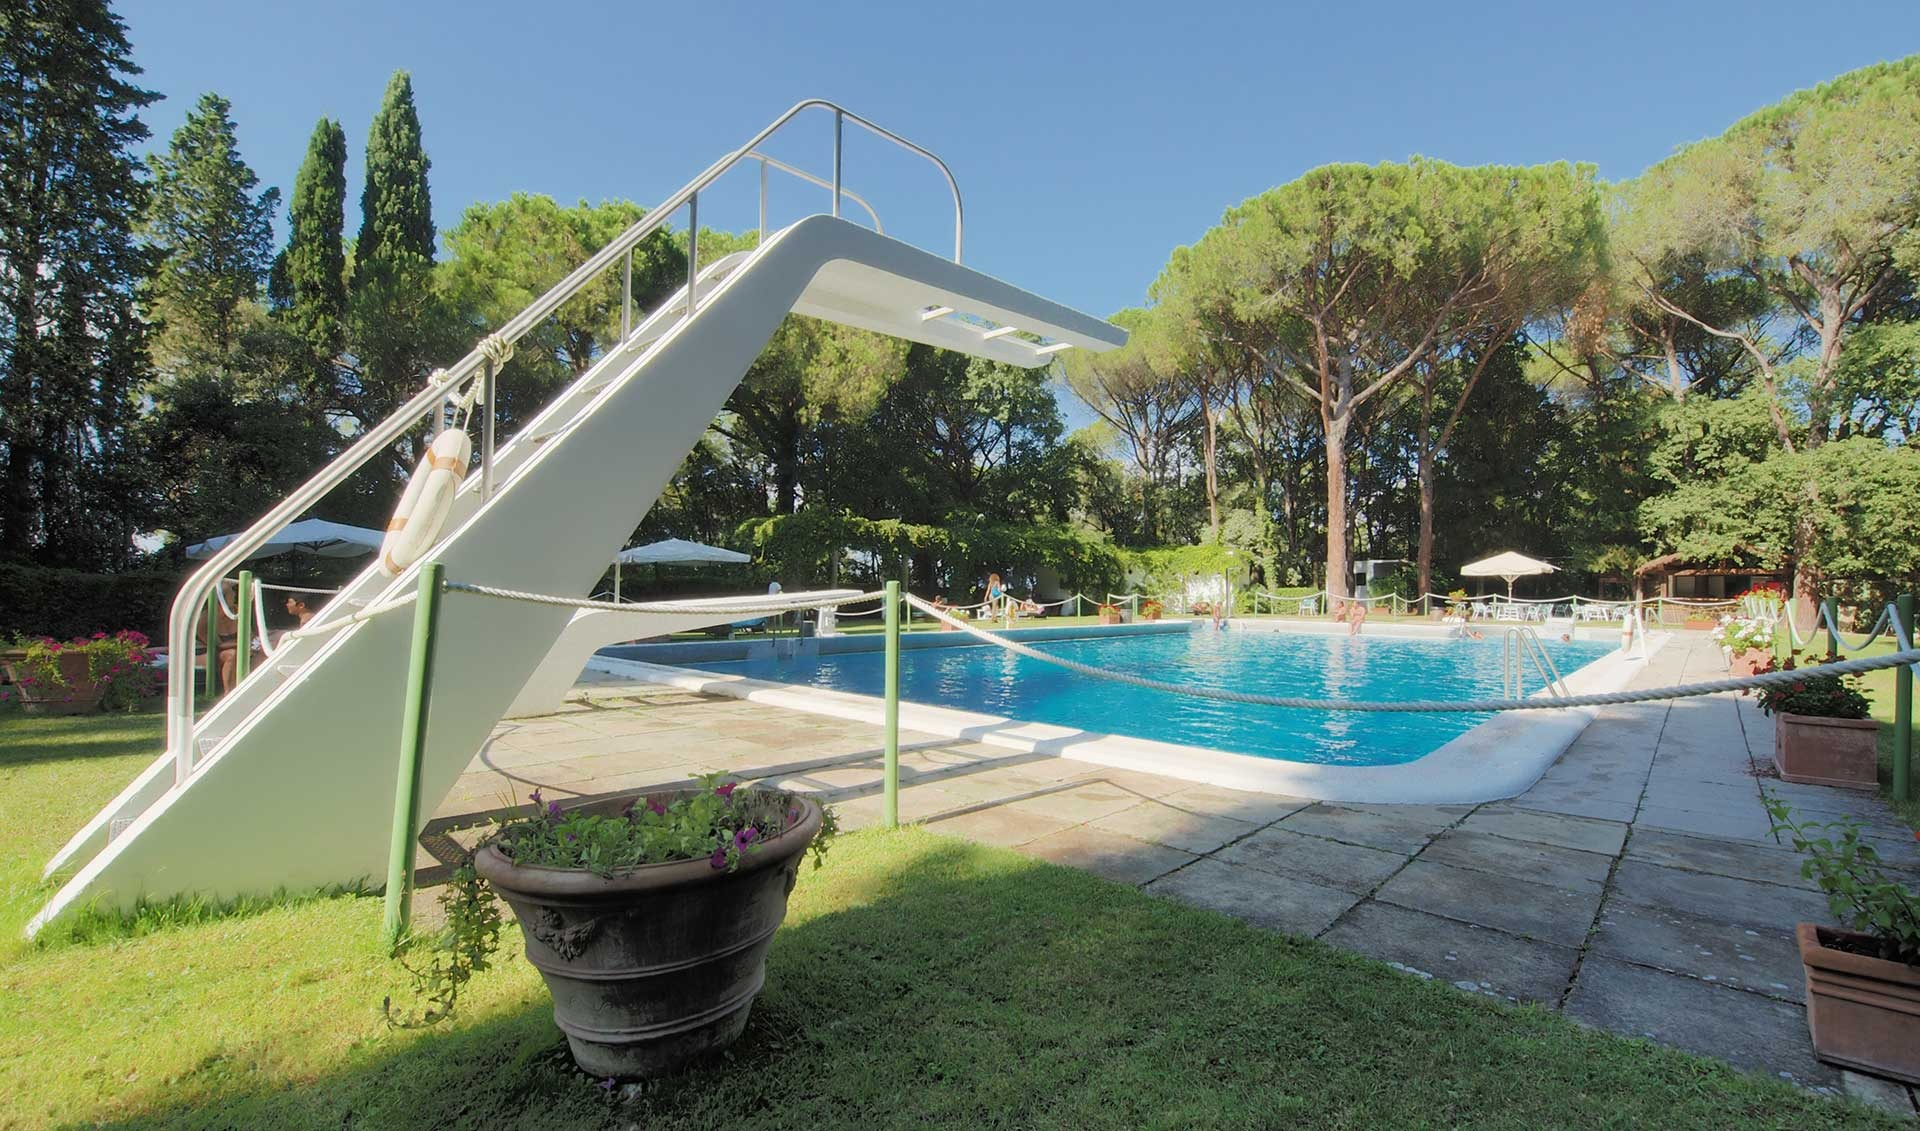 Golf Ugolino Pool